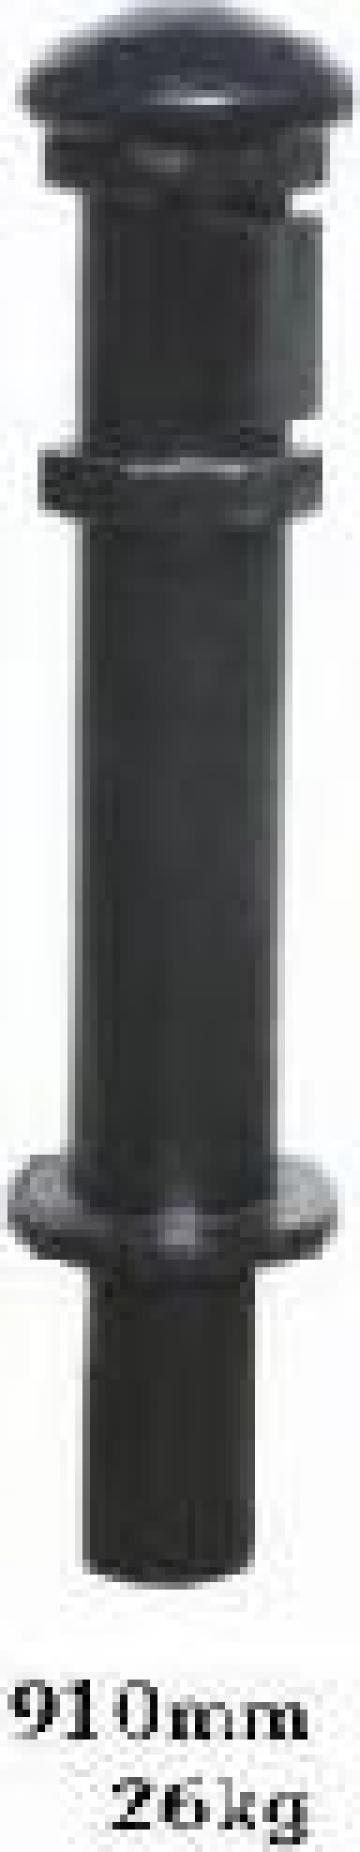 Stalp ornamental fonta restrictionare acces PLGFG3 de la Palagio System Group